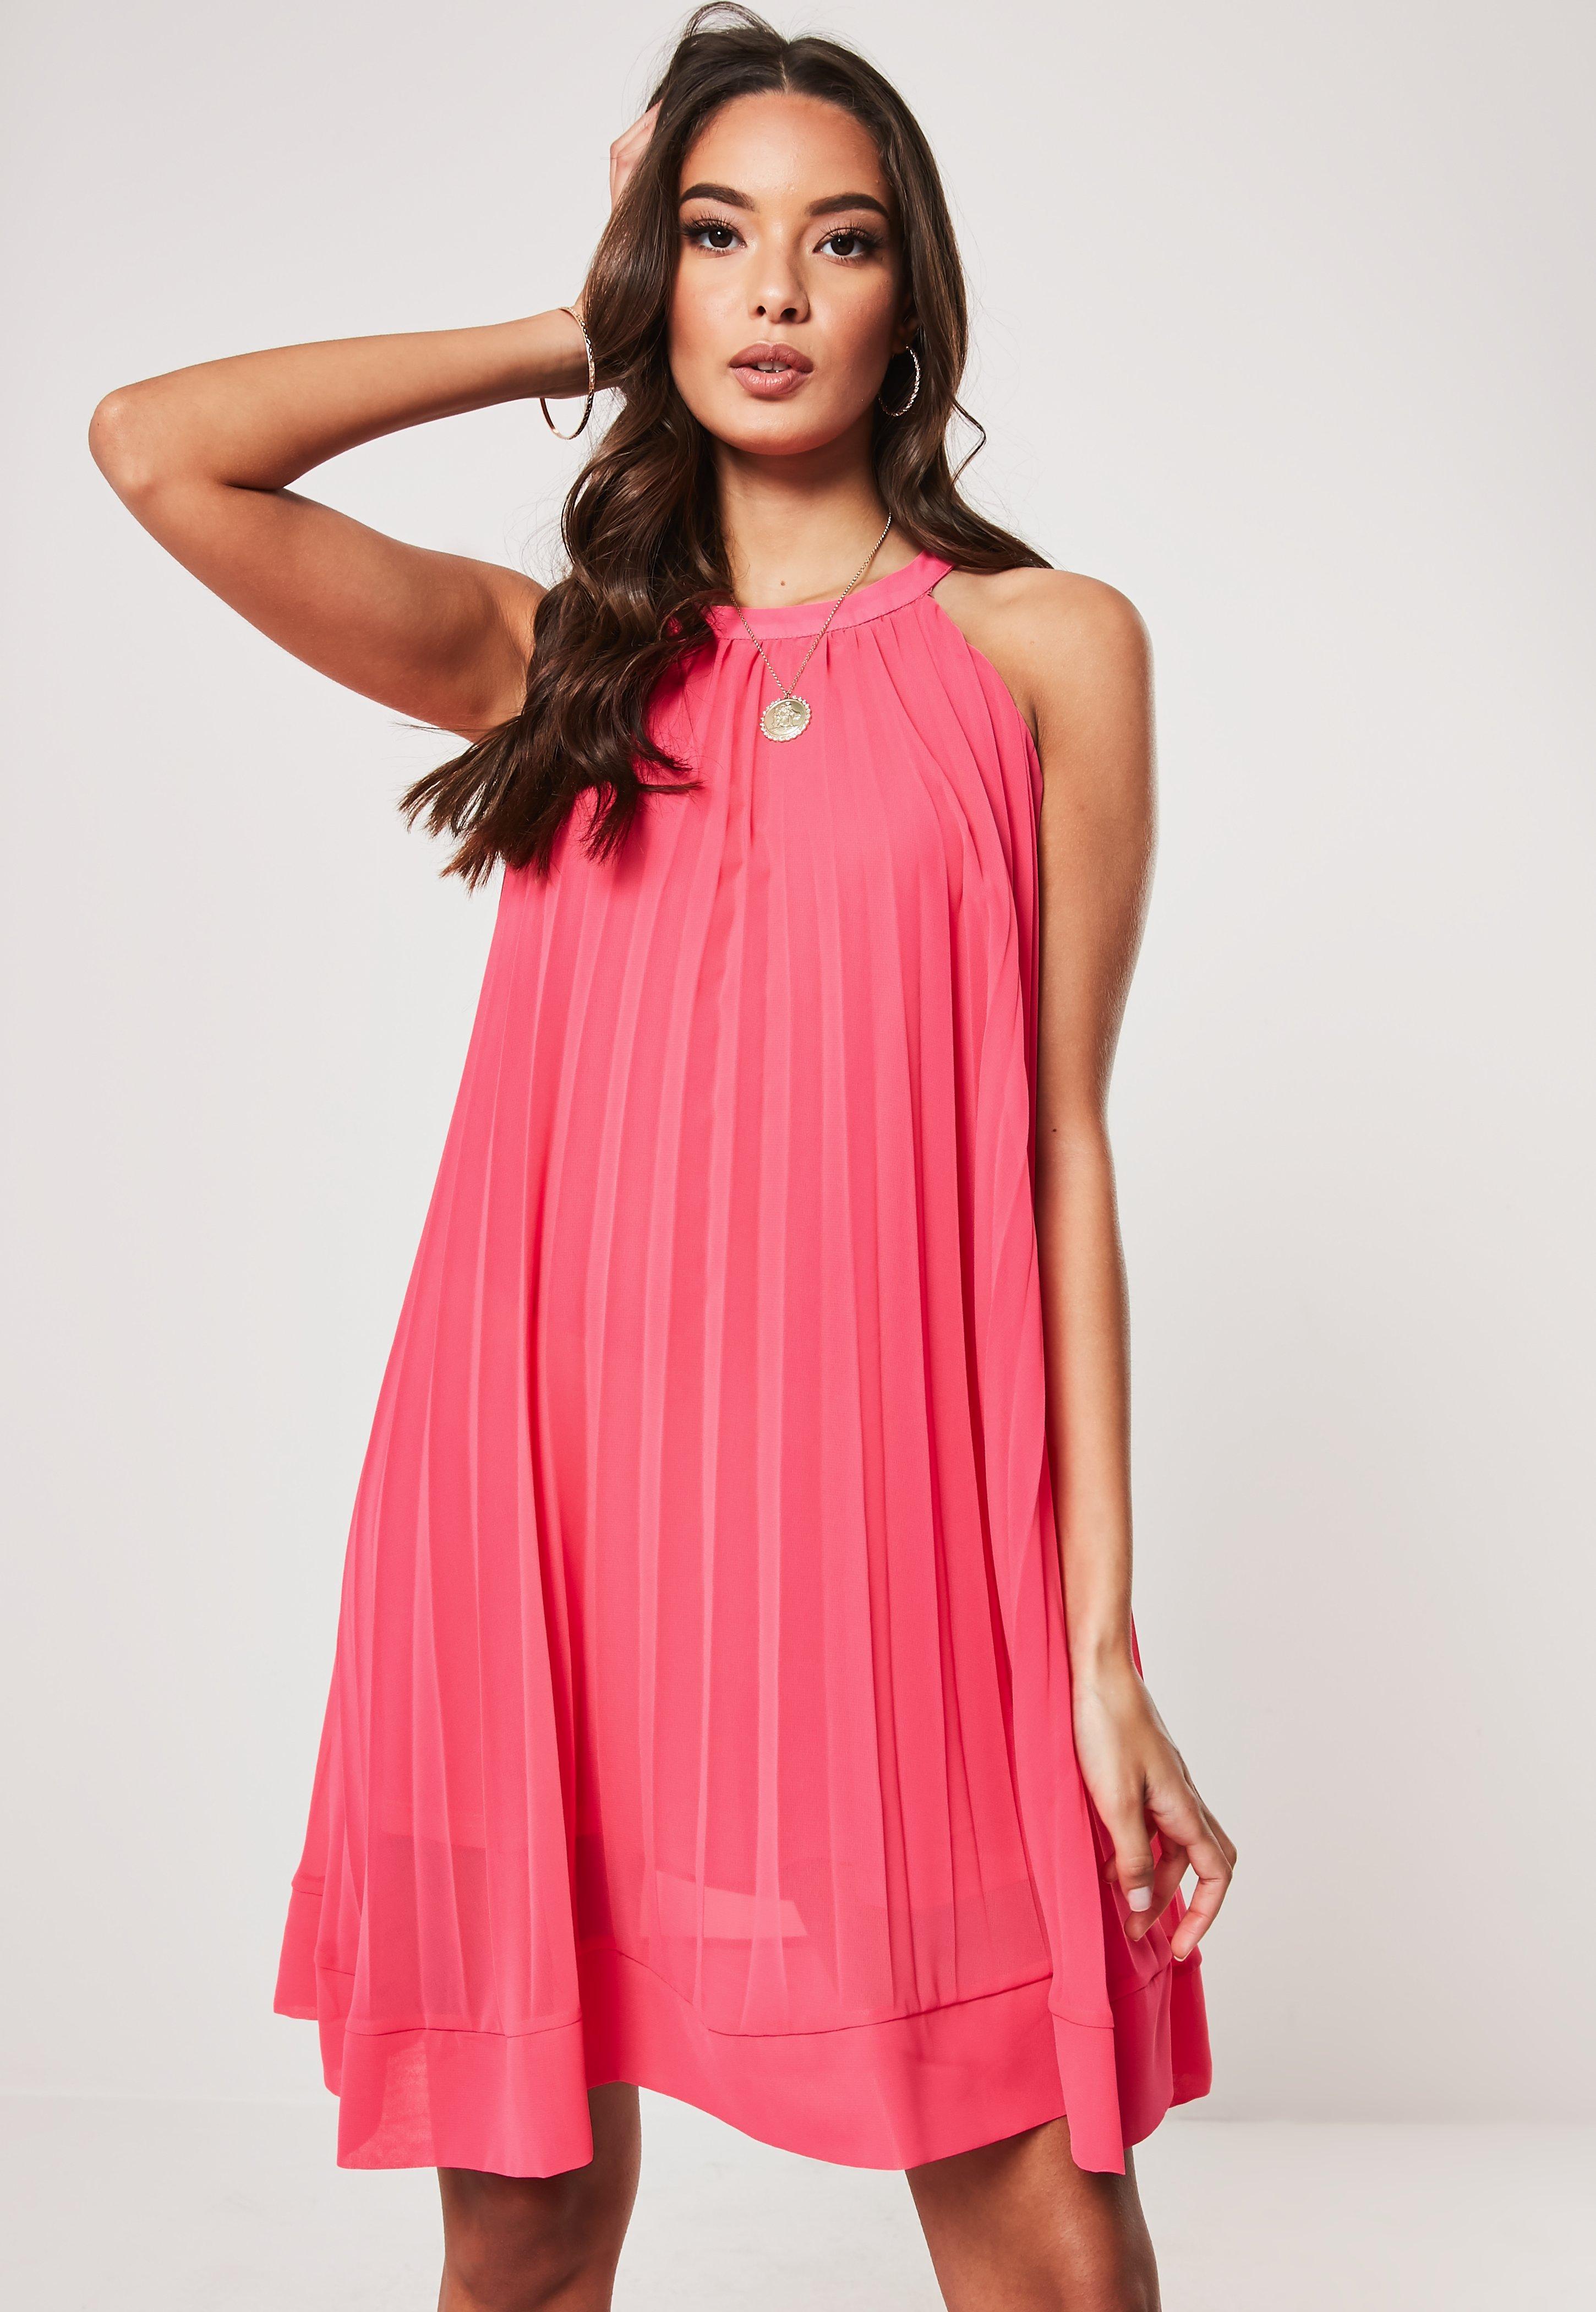 5d5ea6db35382 Swing Dresses | Shop Floaty Dresses - Missguided